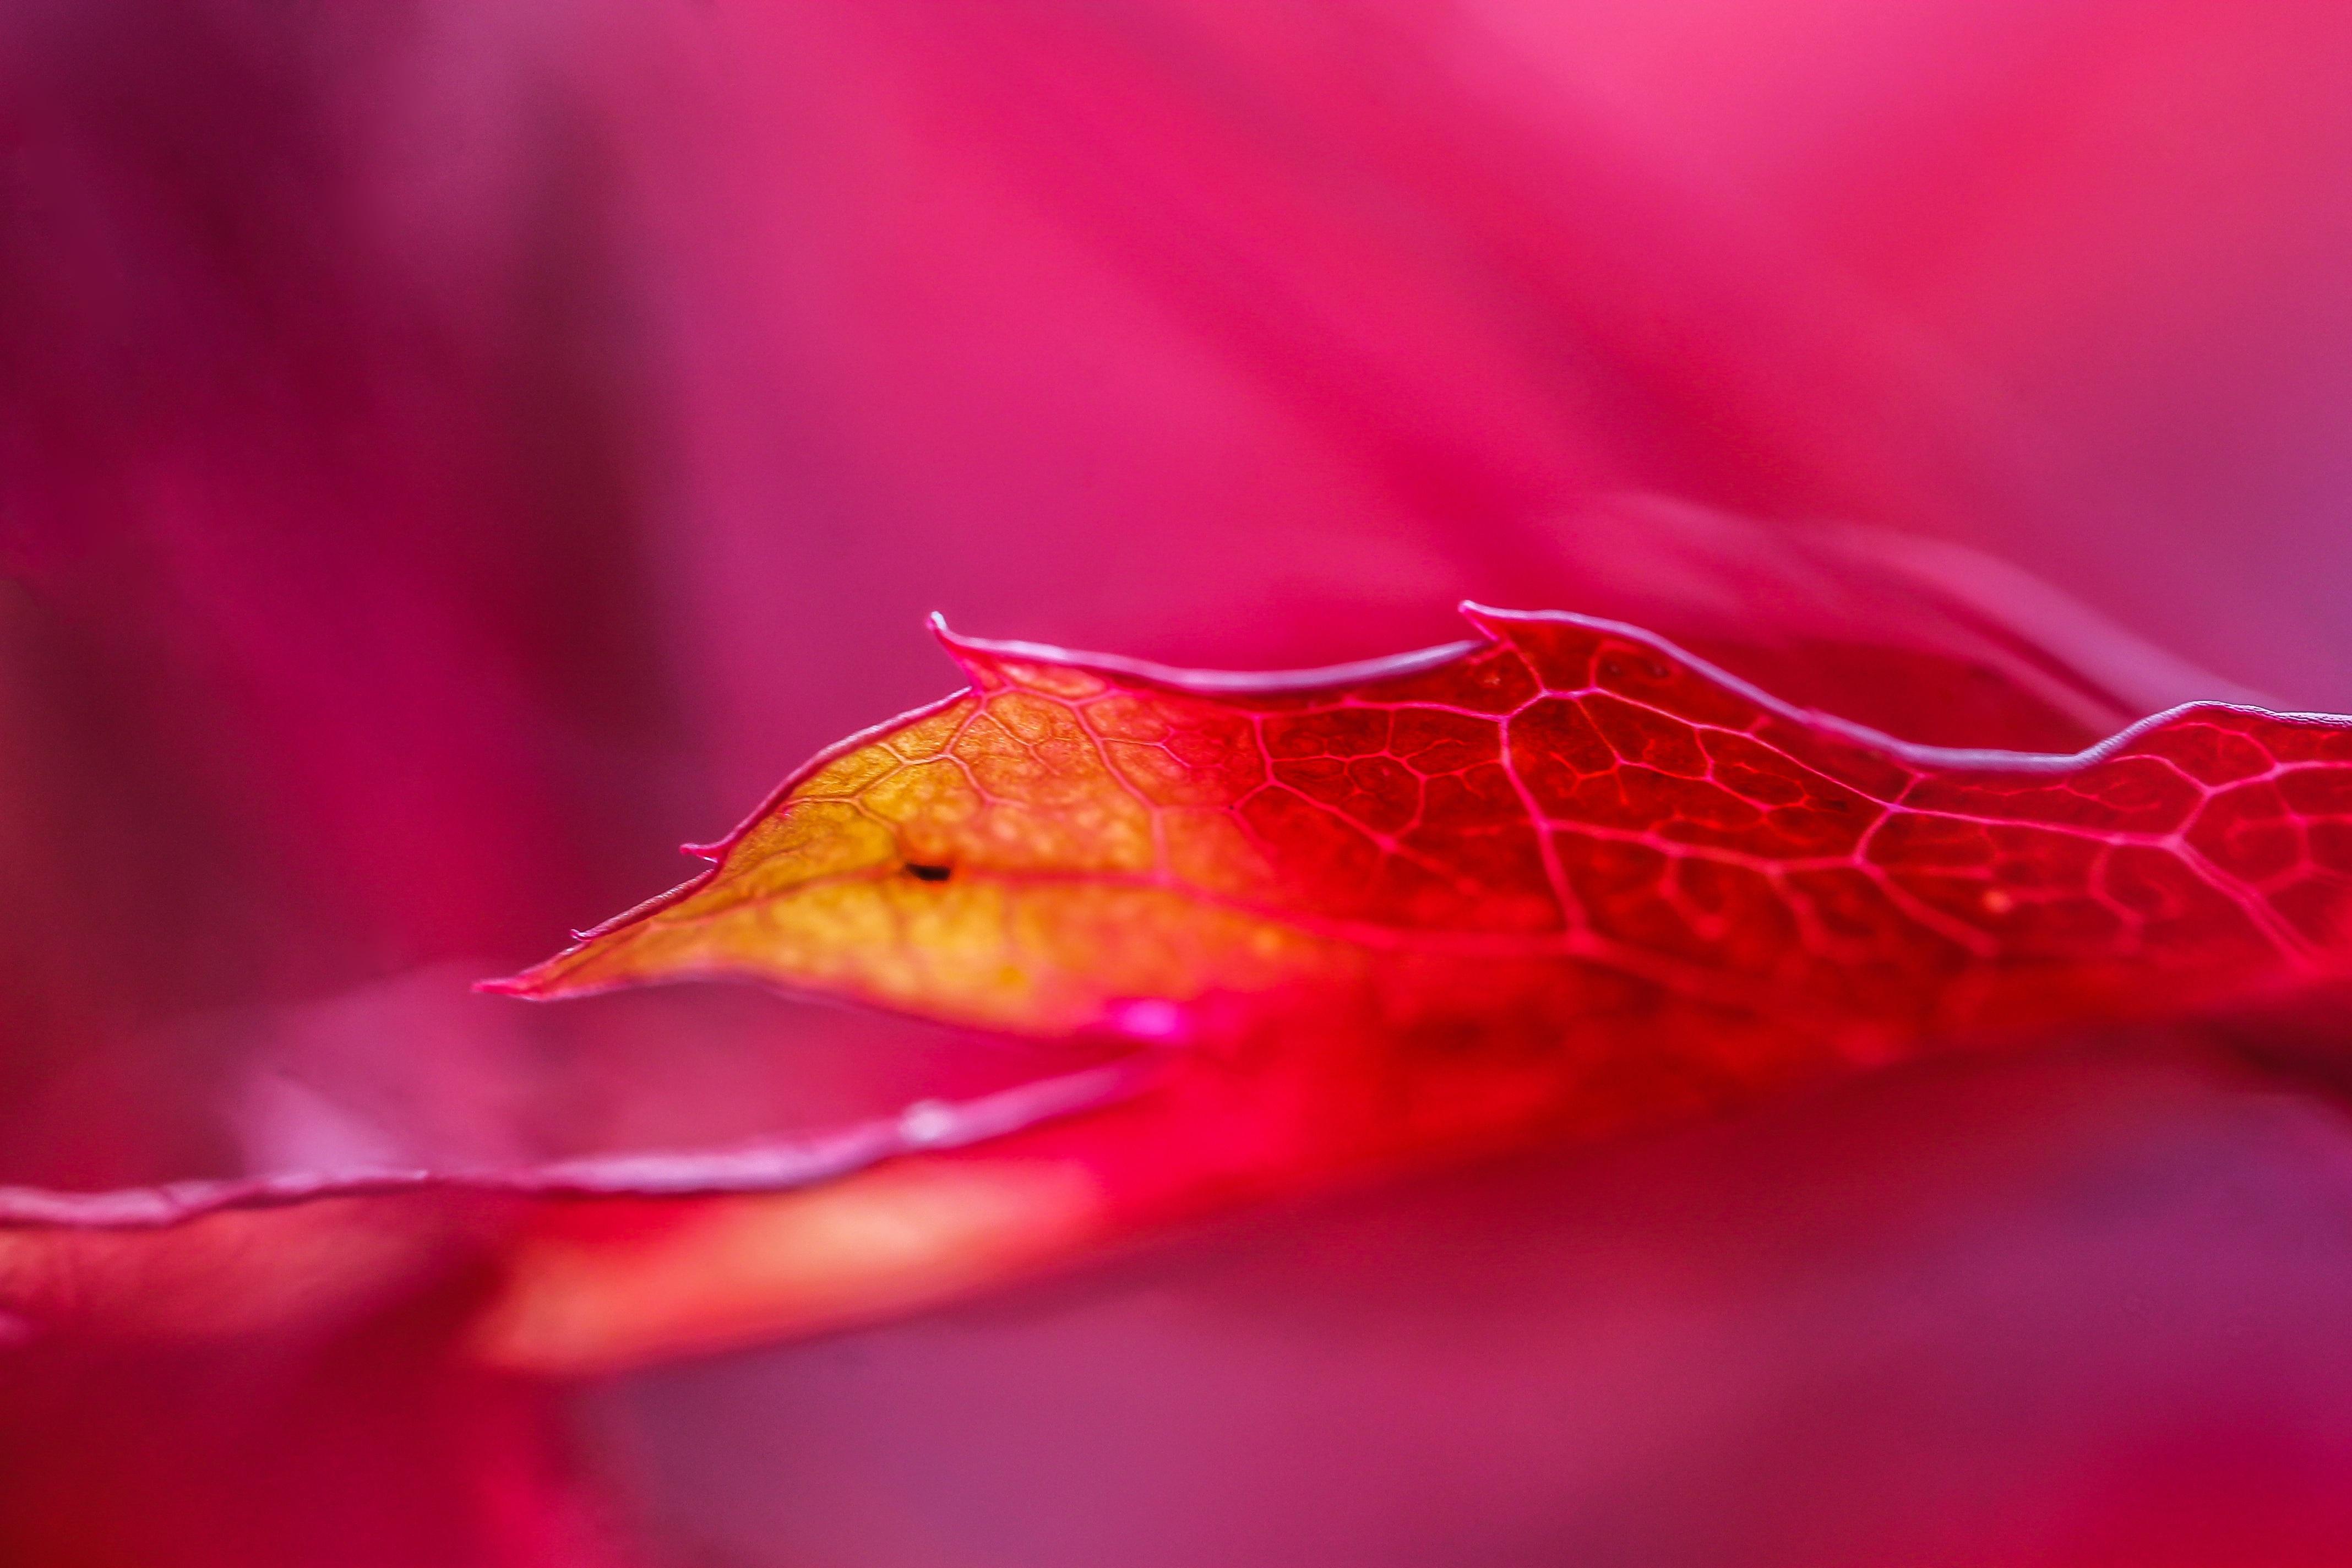 Free Images : nature, flower, petal, red, color, pink, flora, maple ...